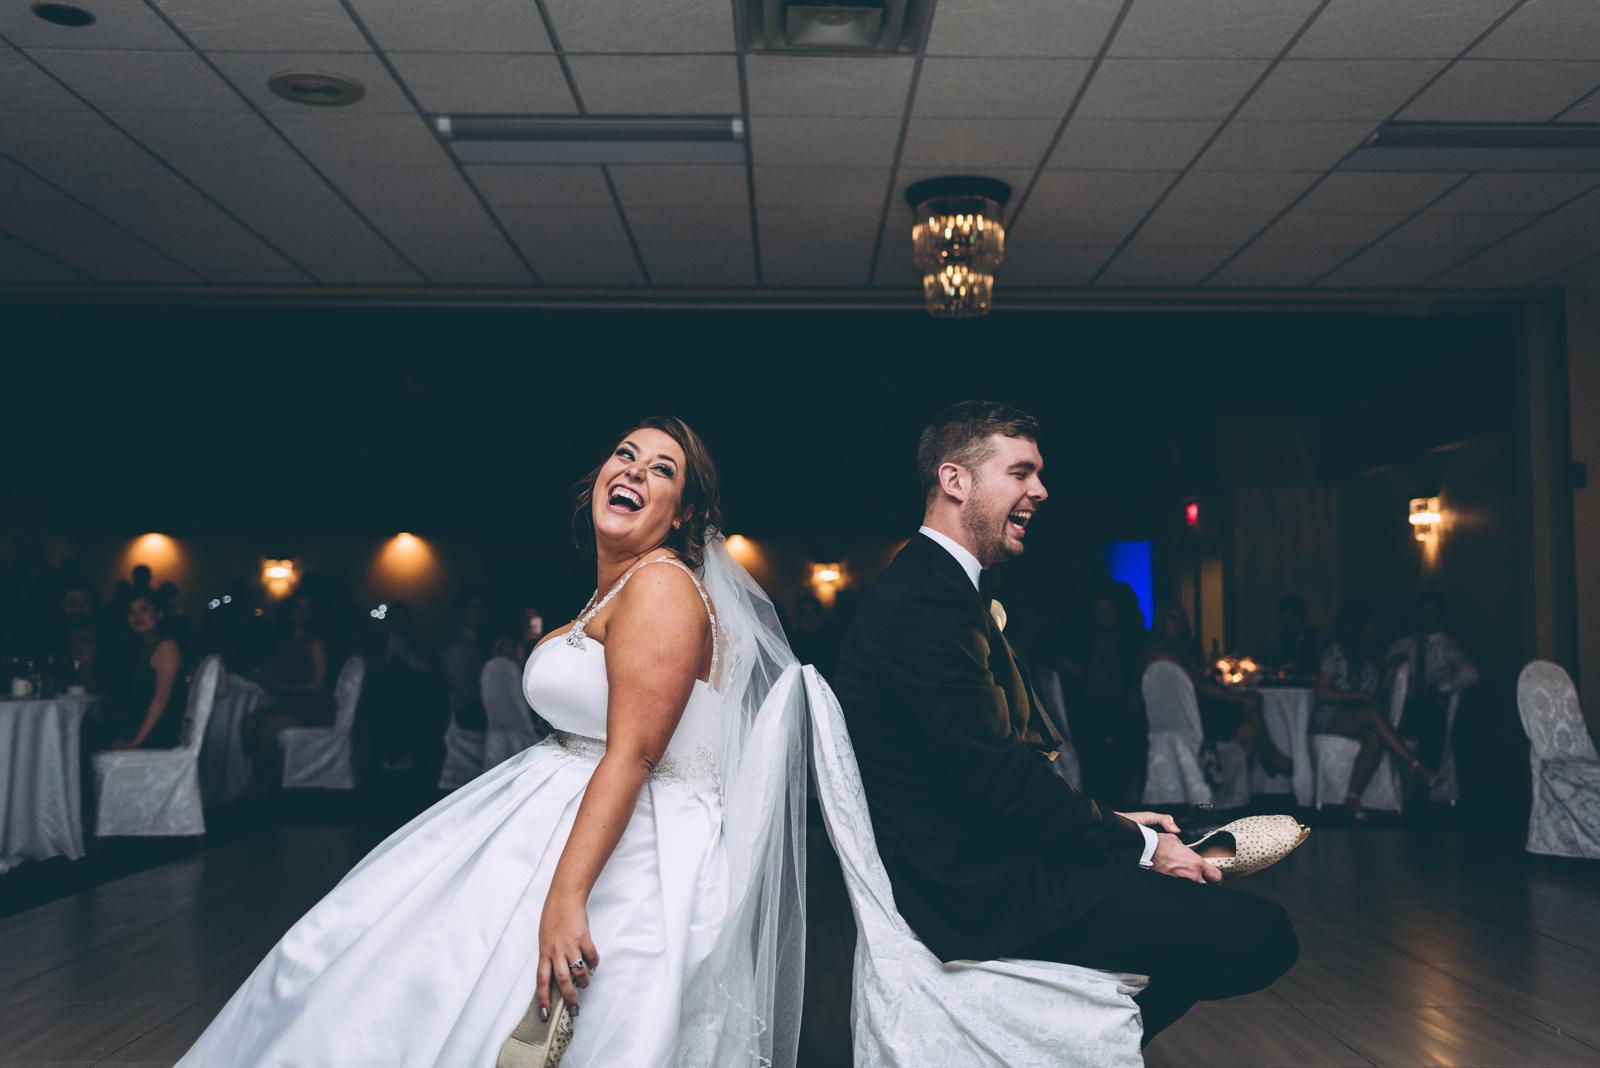 top-wedding-photos-2018-blog-9.jpg